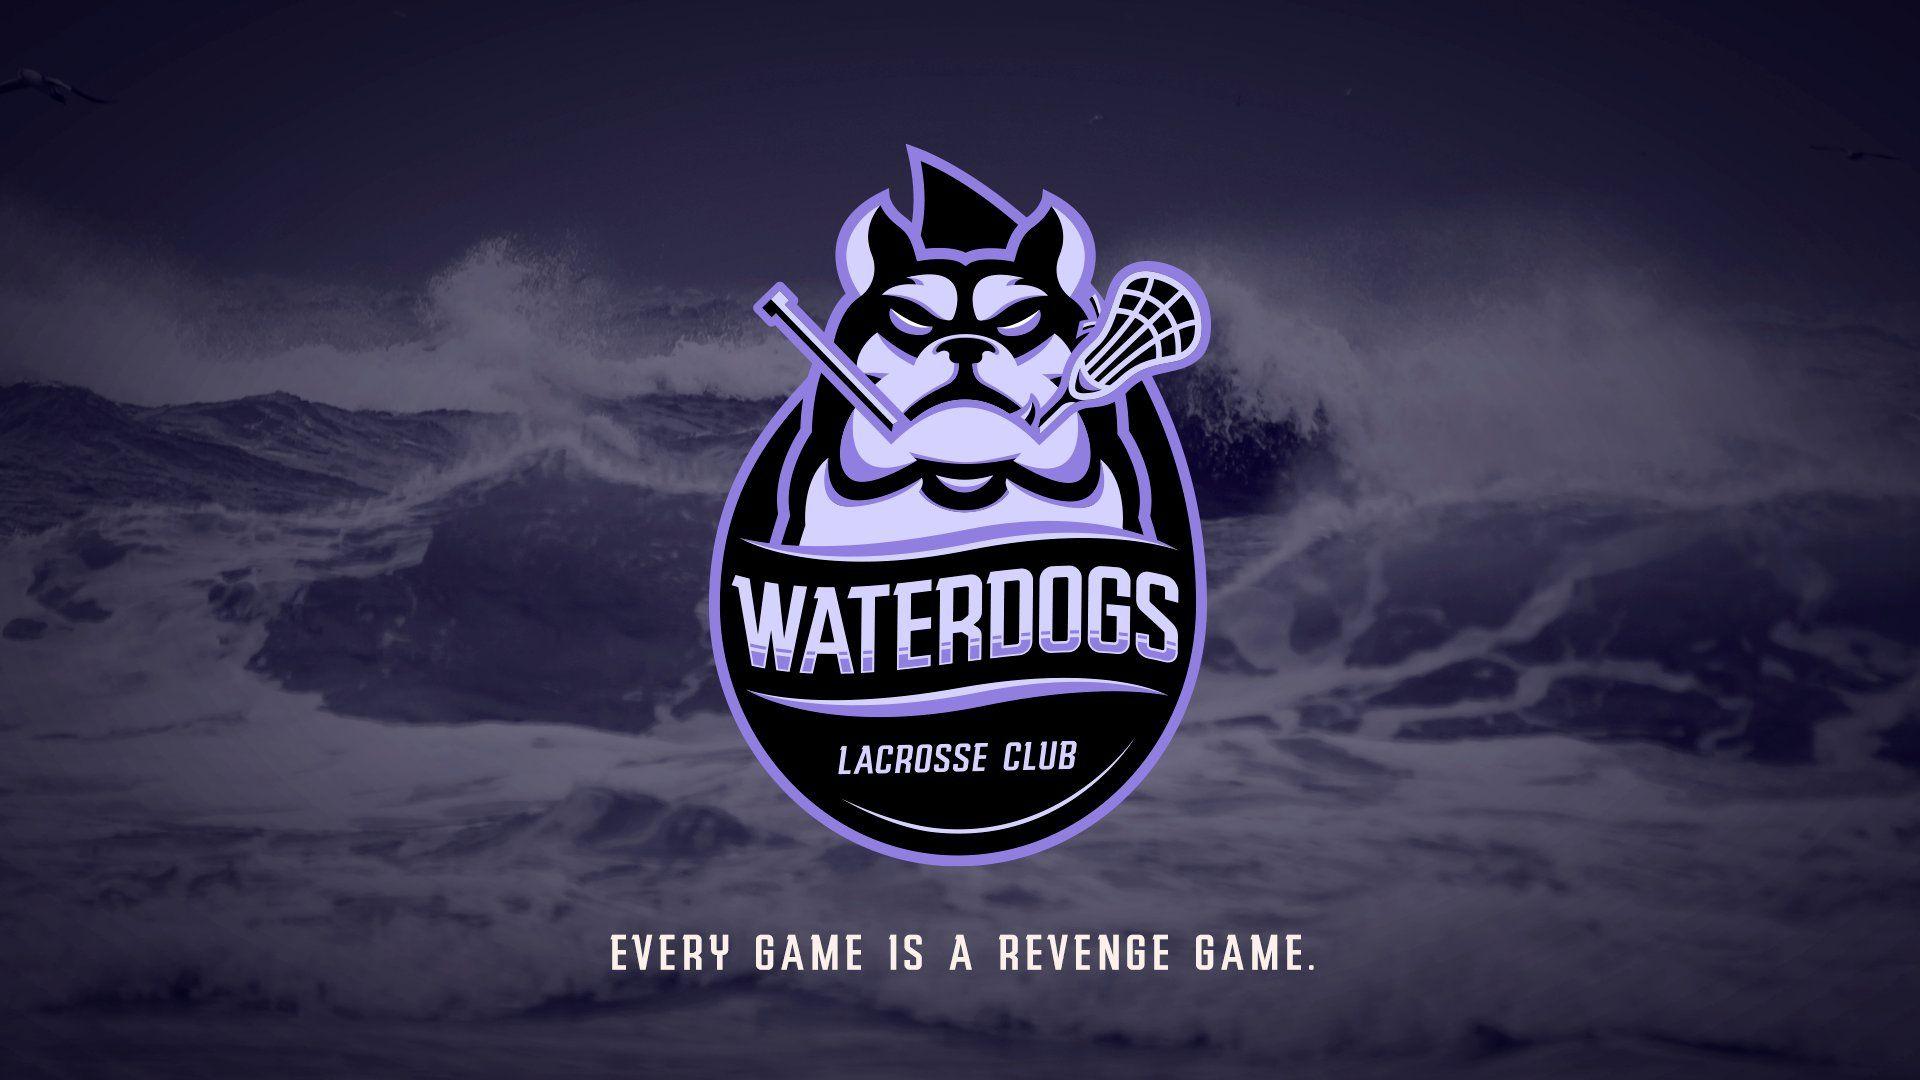 Waterdogs logo